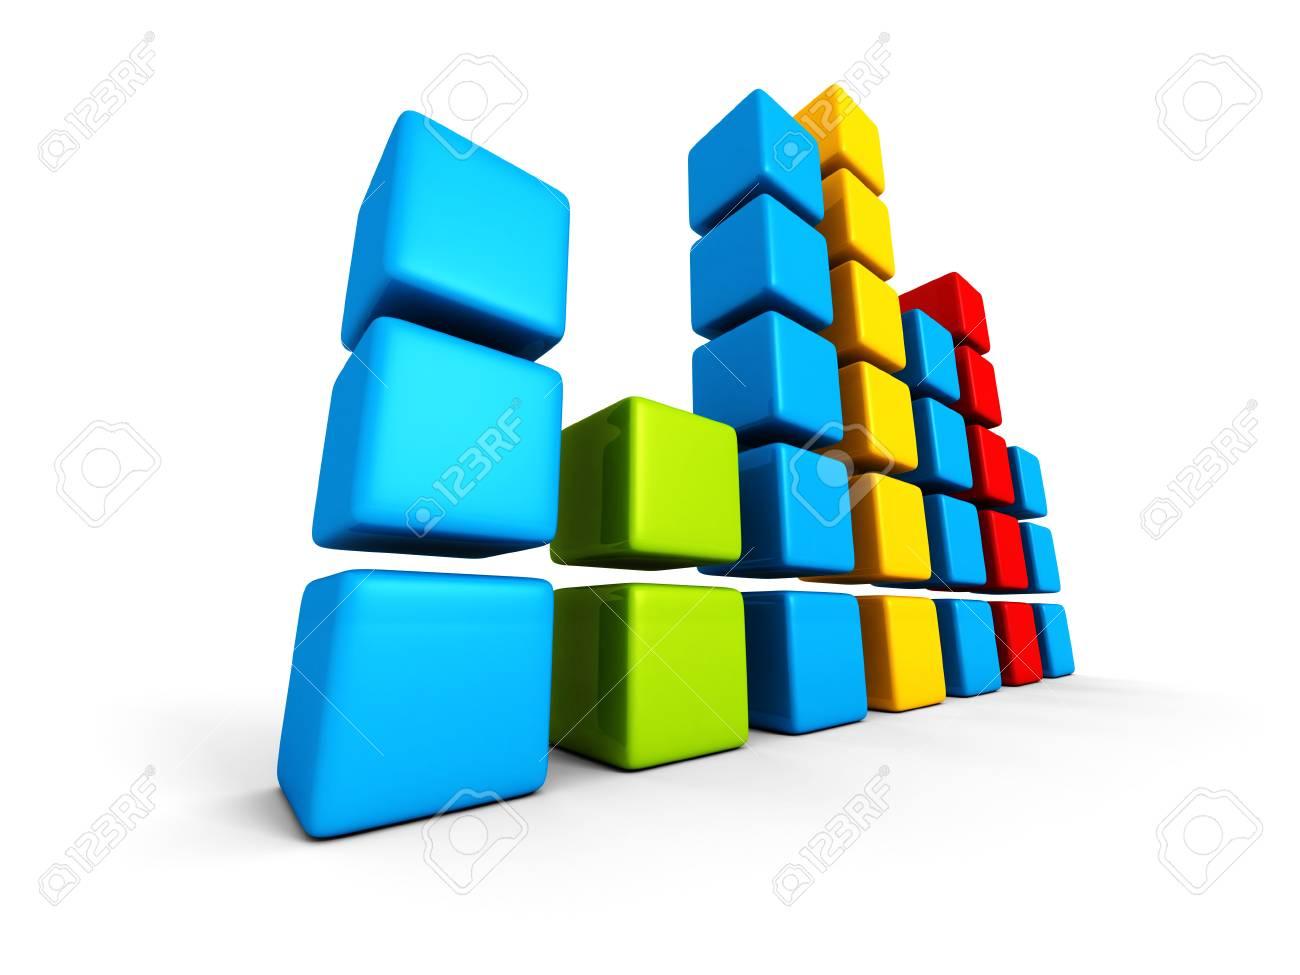 hight resolution of colorful block bar chart diagram on white background 3d render illustration stock illustration 32458778